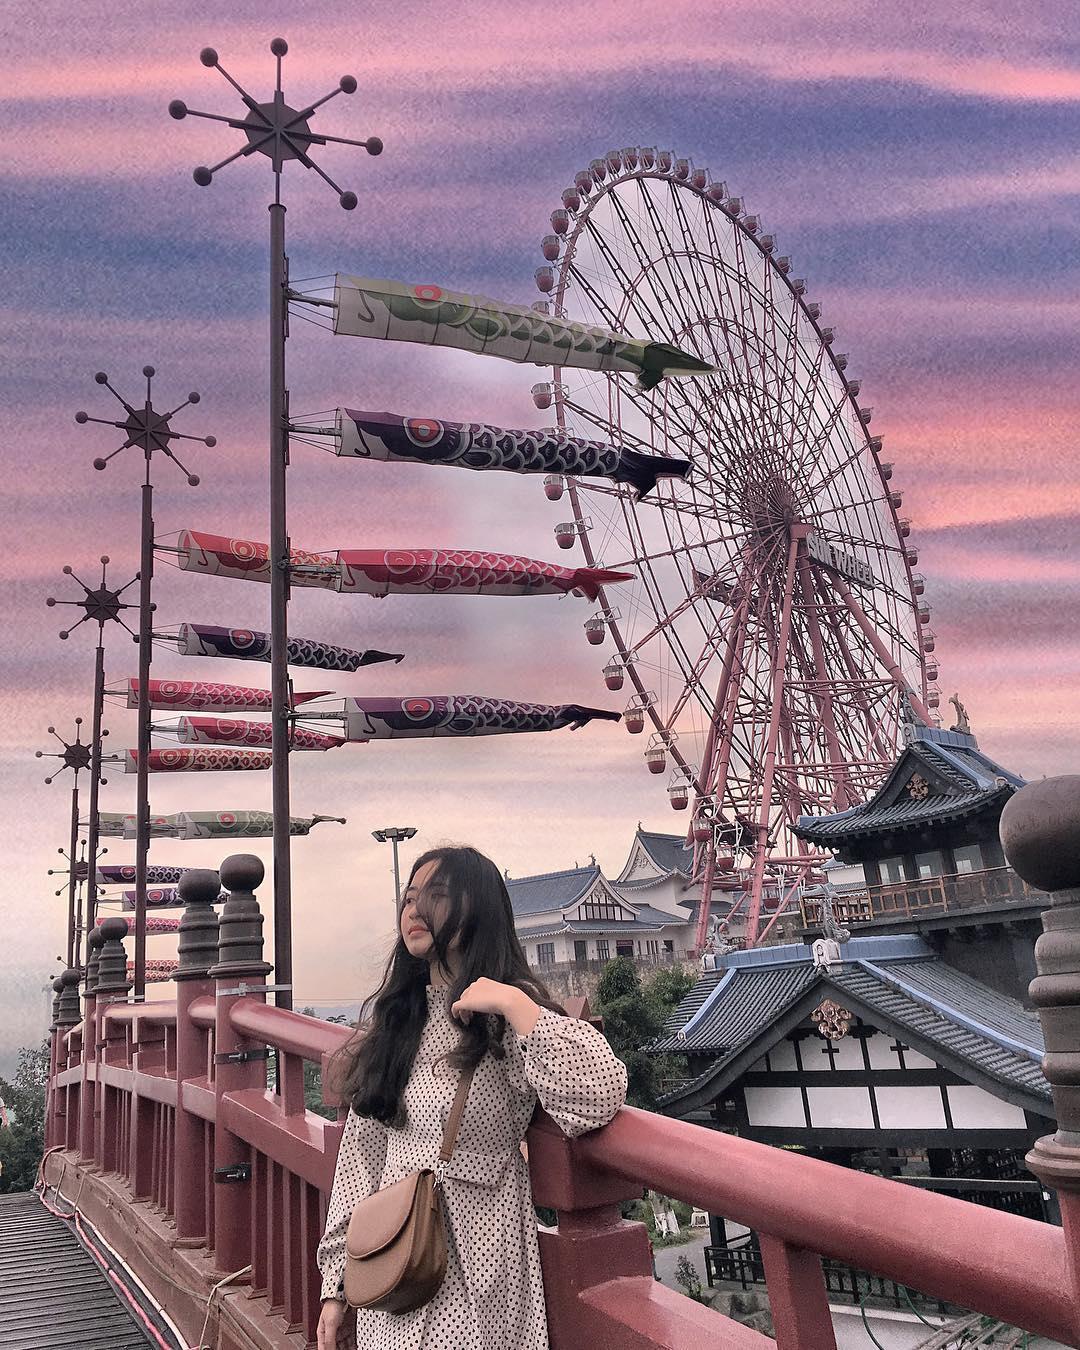 Quangninh_sun-world-halong-03